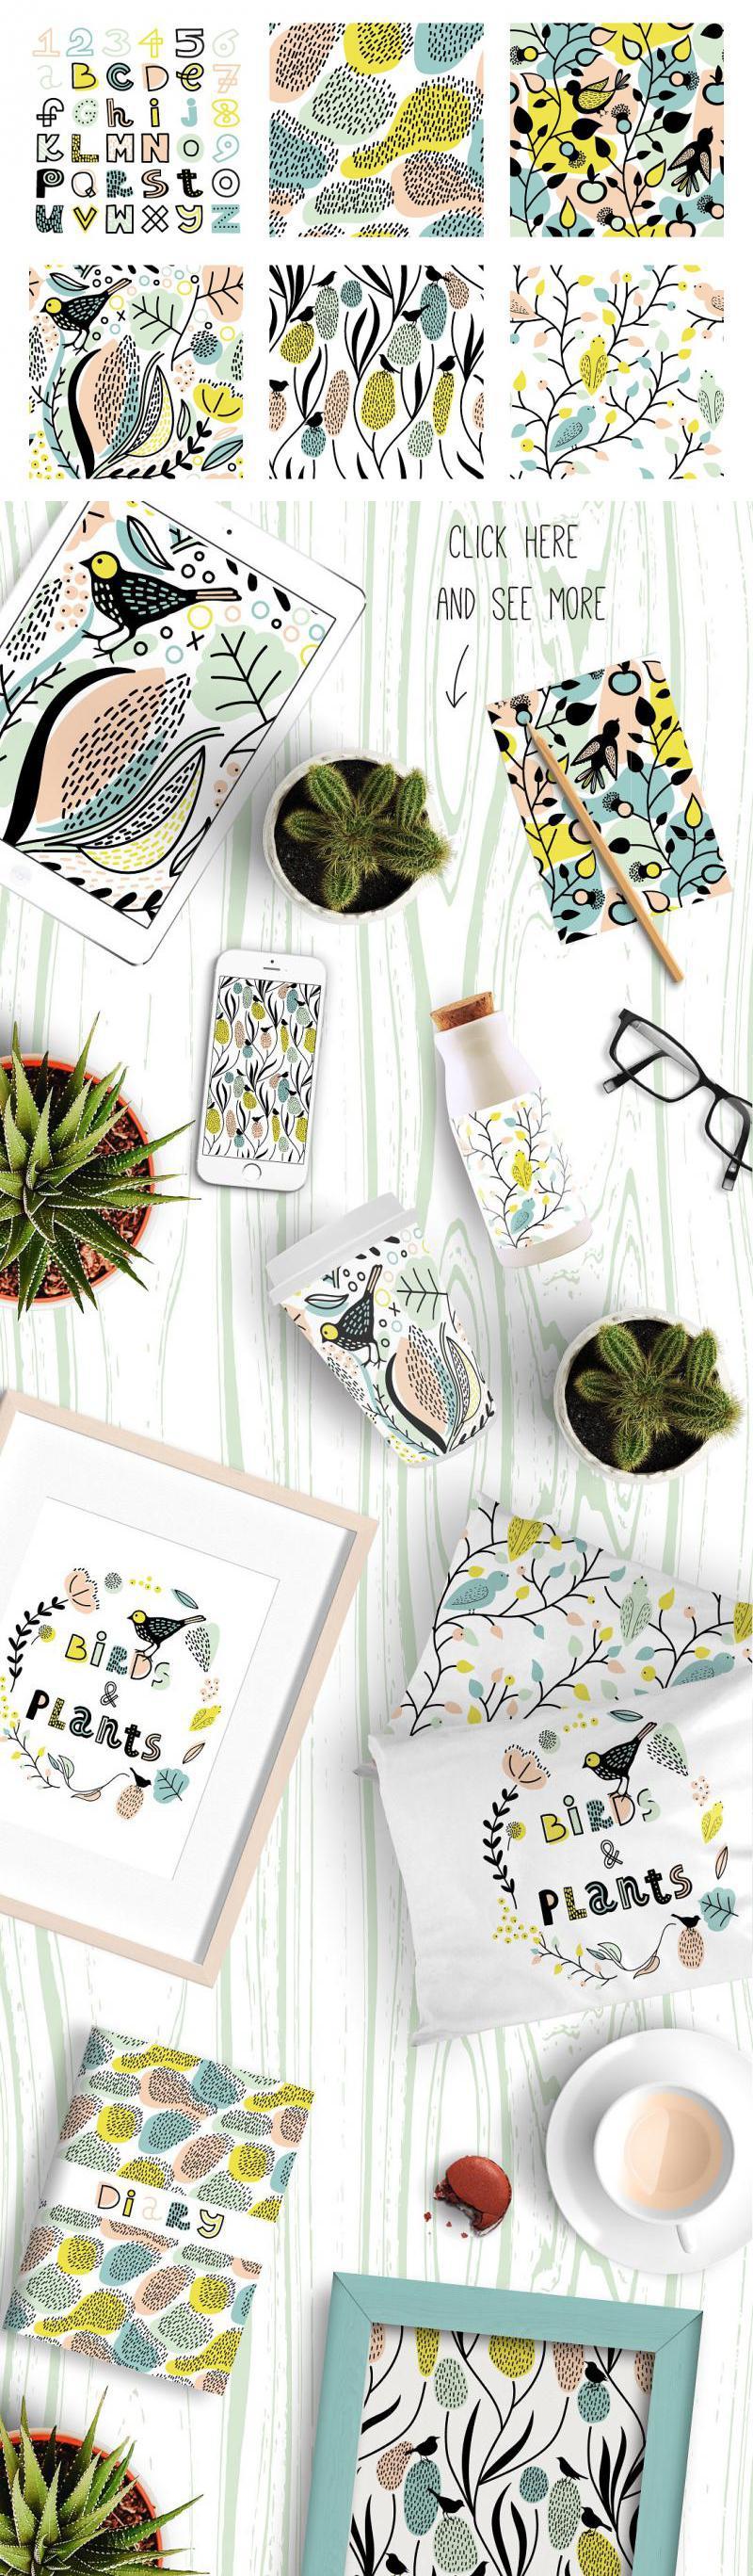 Birds & Plants